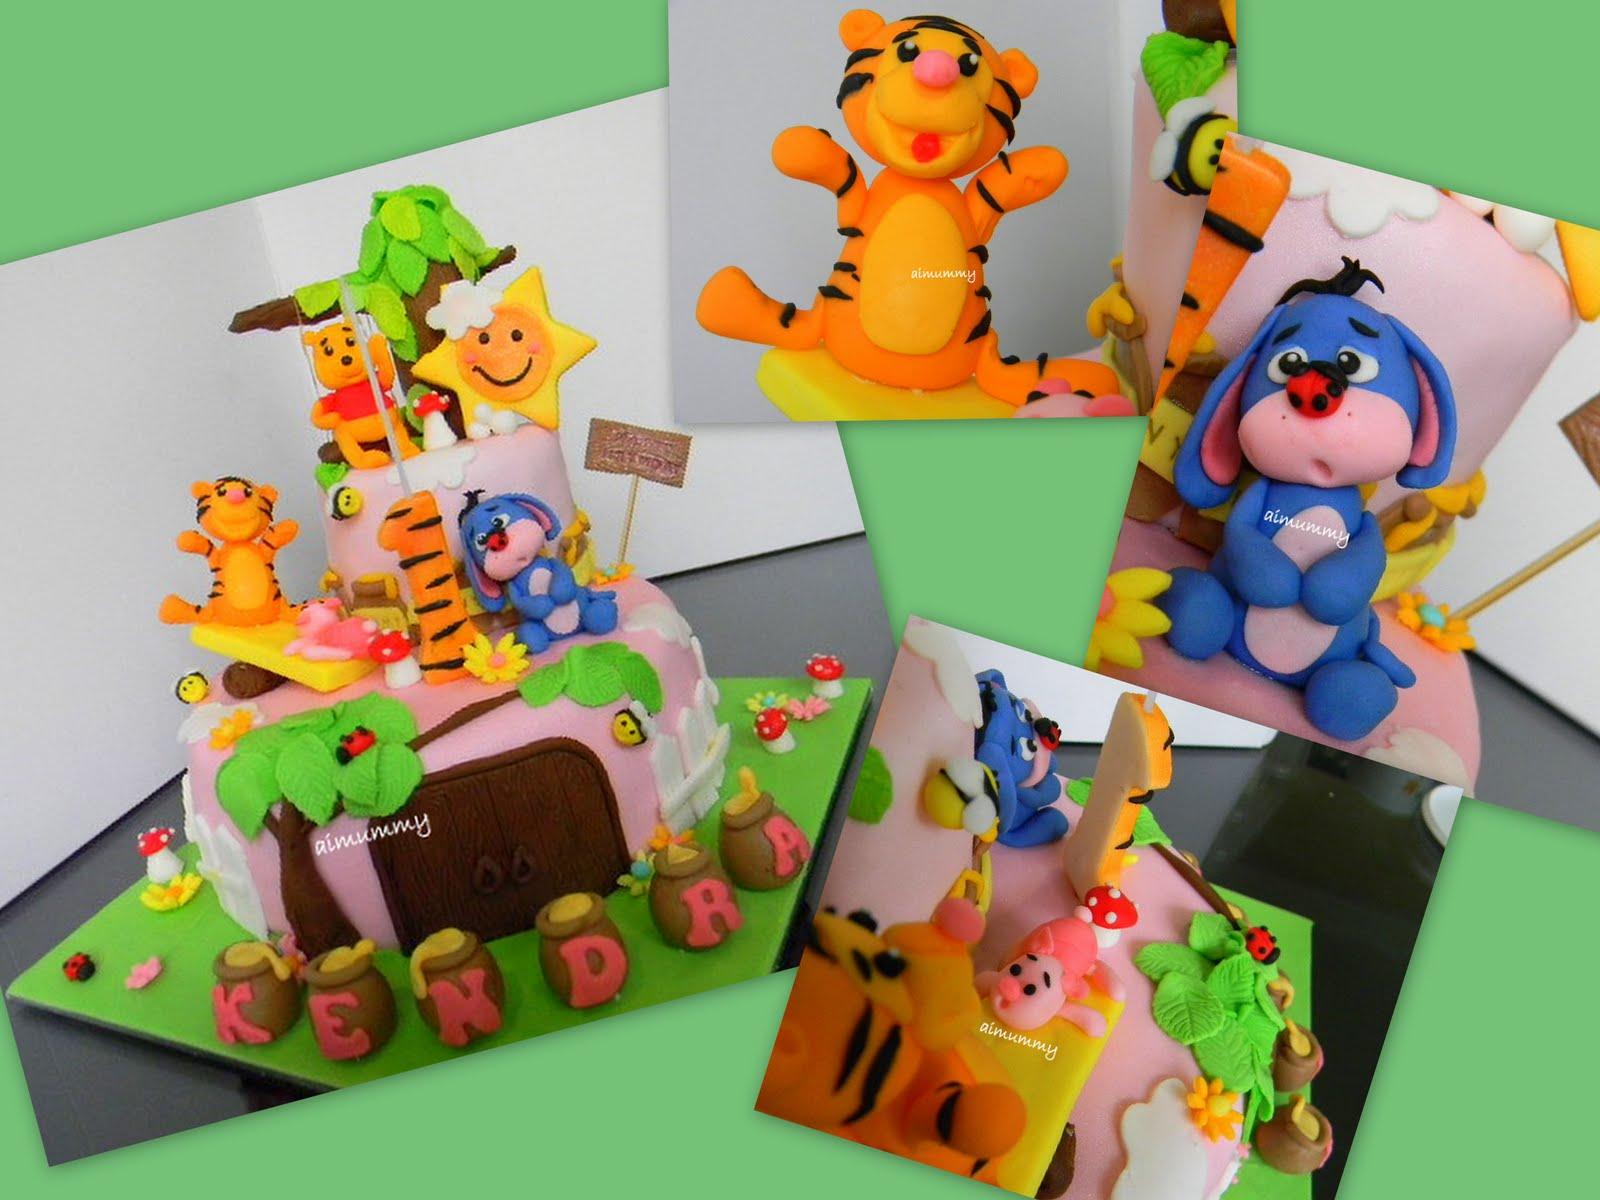 Aimummy Kendras Pooh Playground Cake